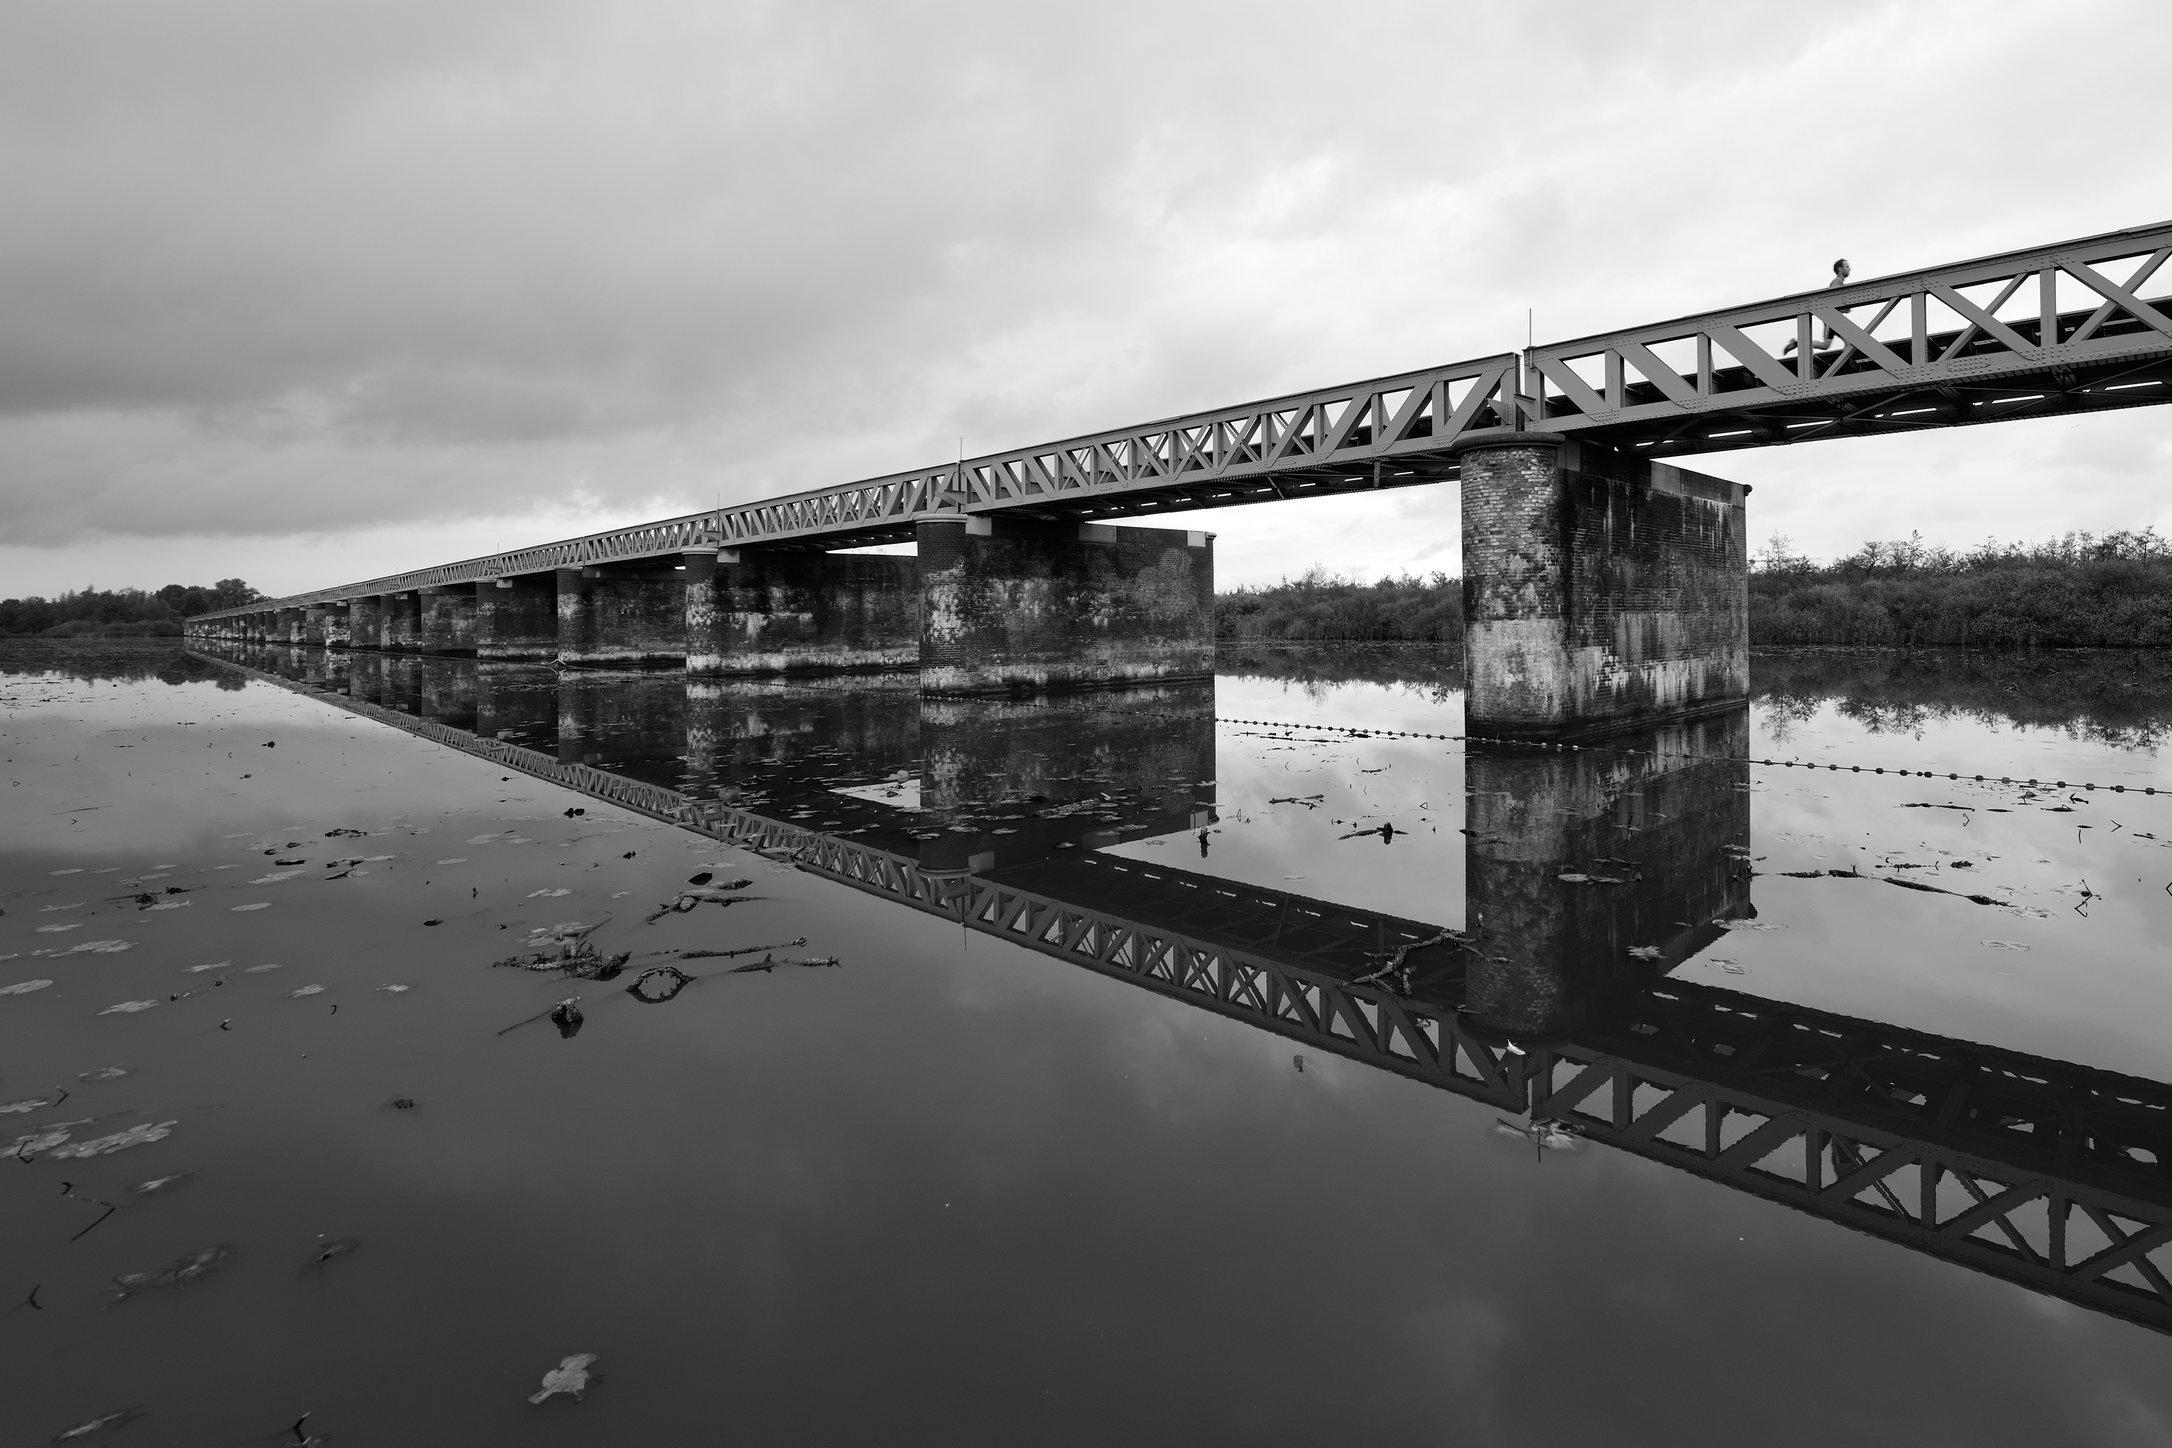 Bridge by Moerputten (NL)